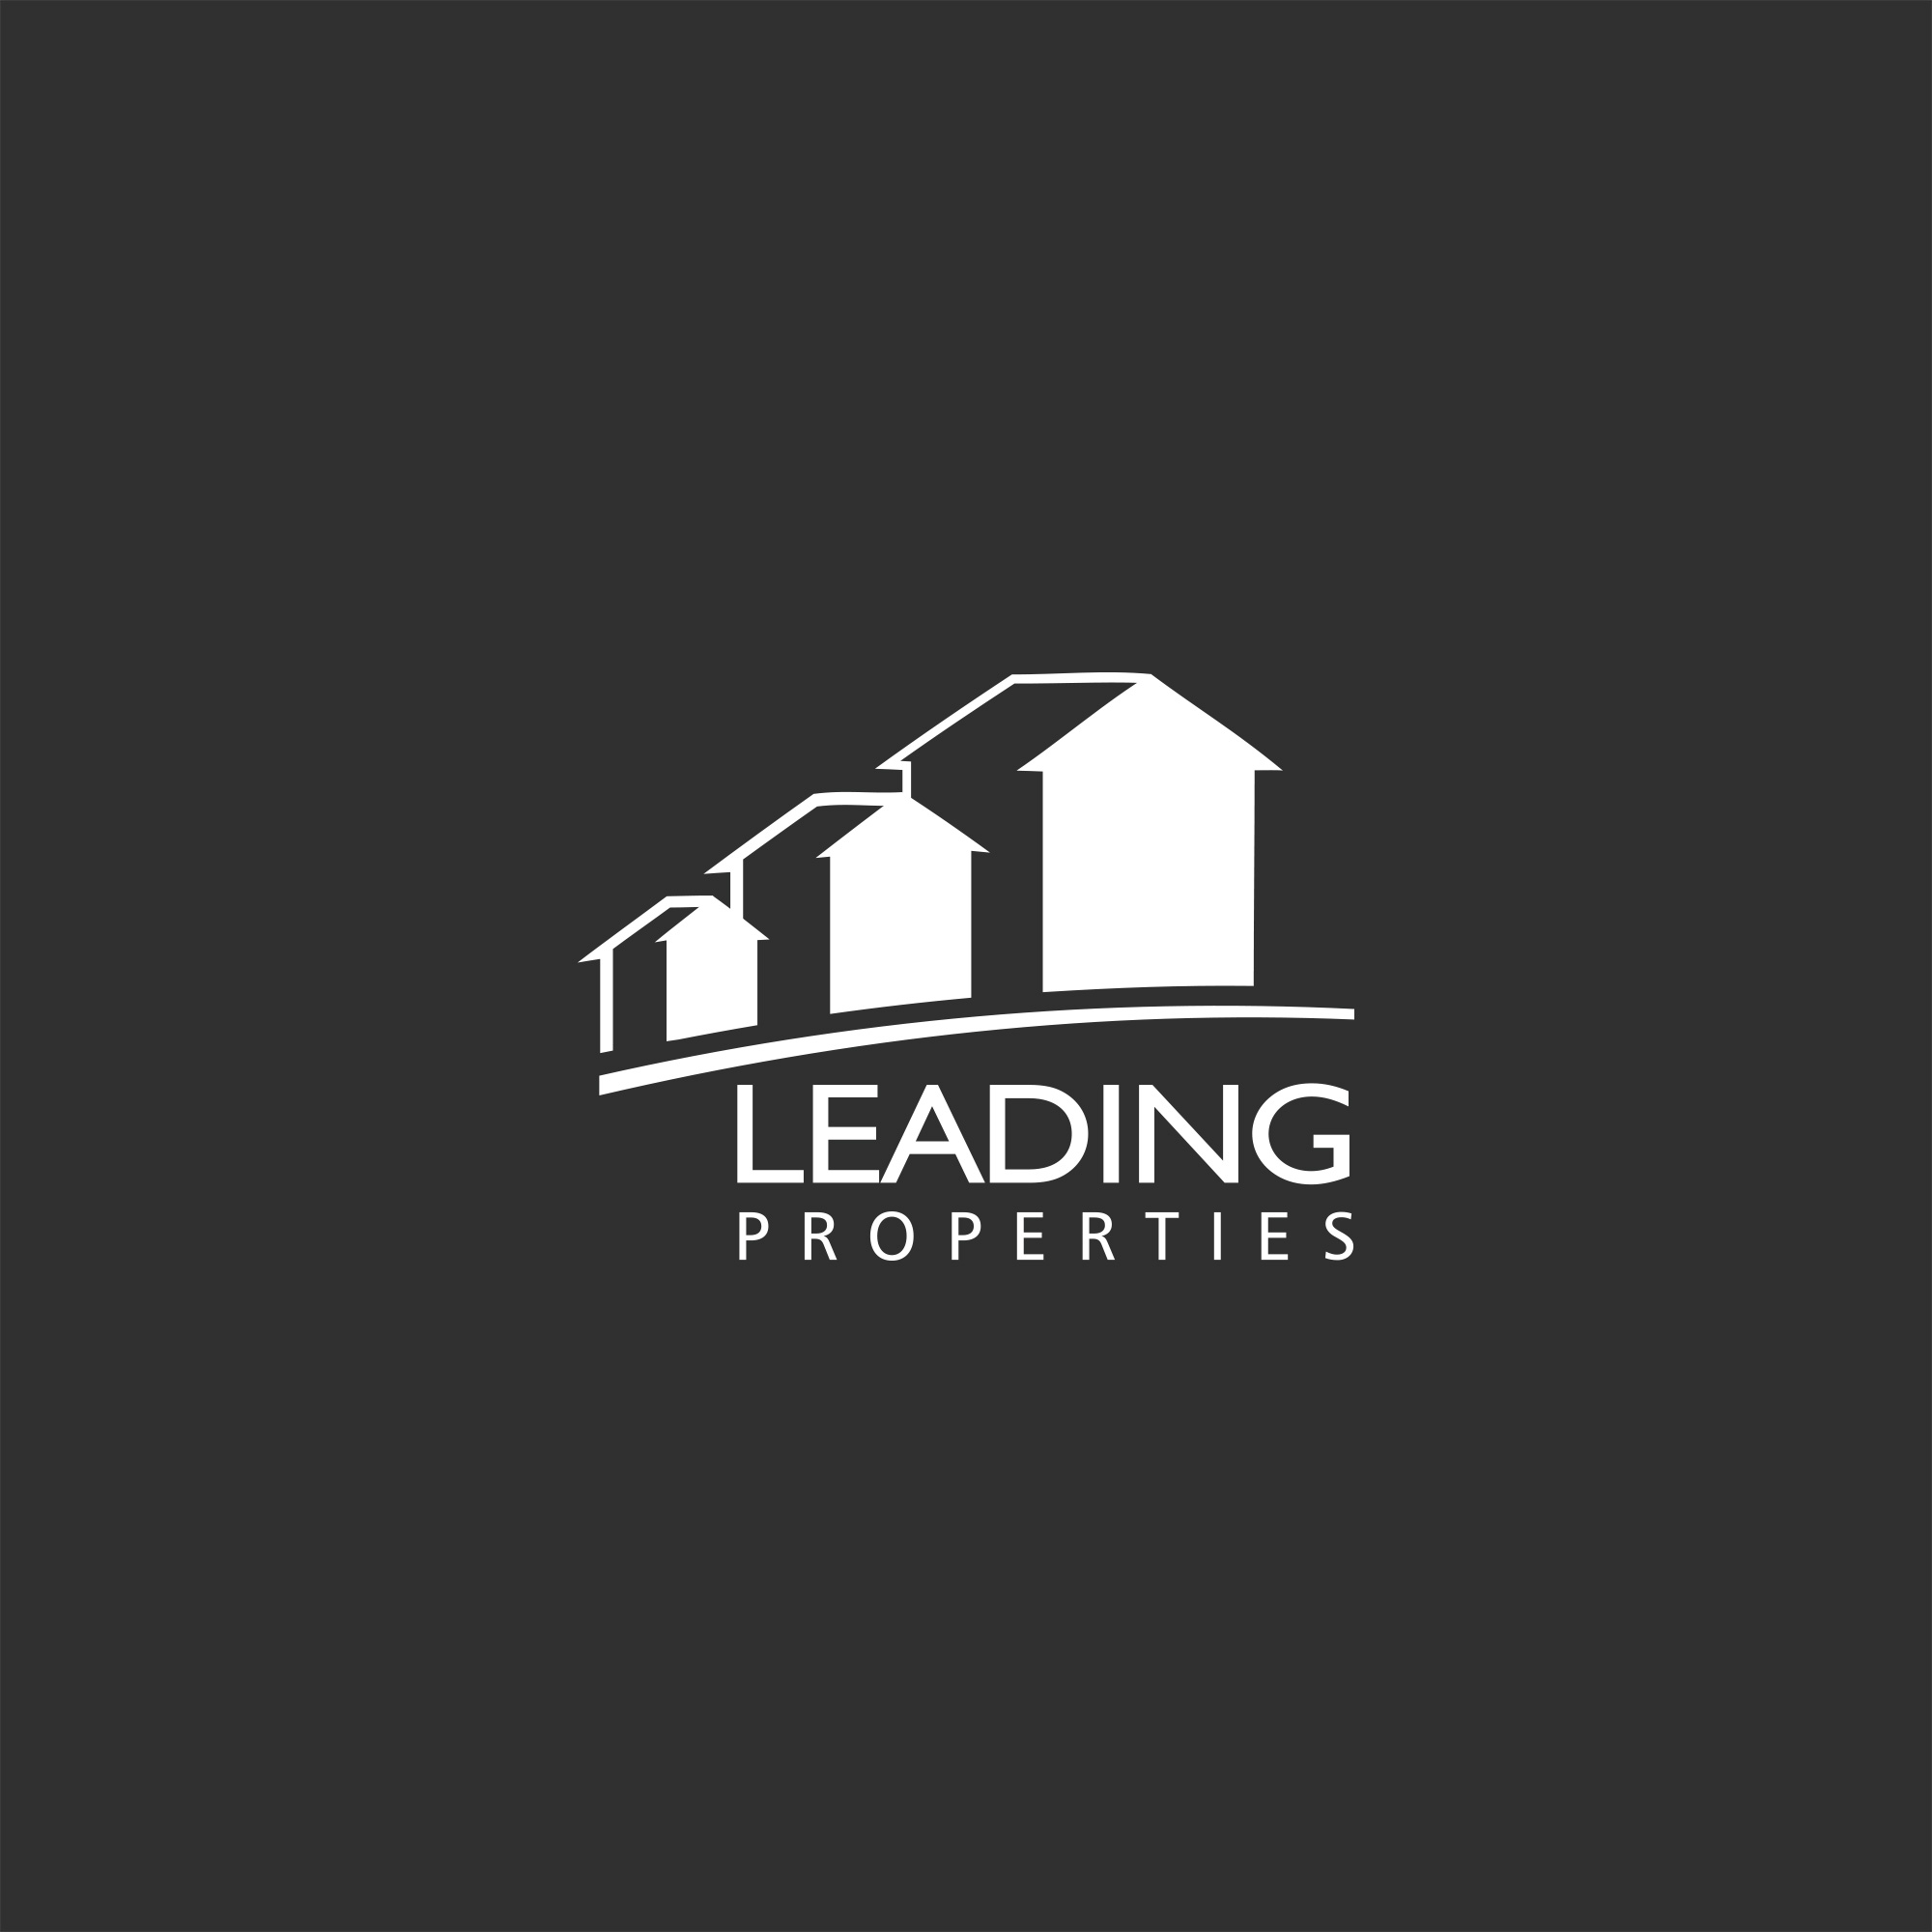 Leading Properties Logo Design